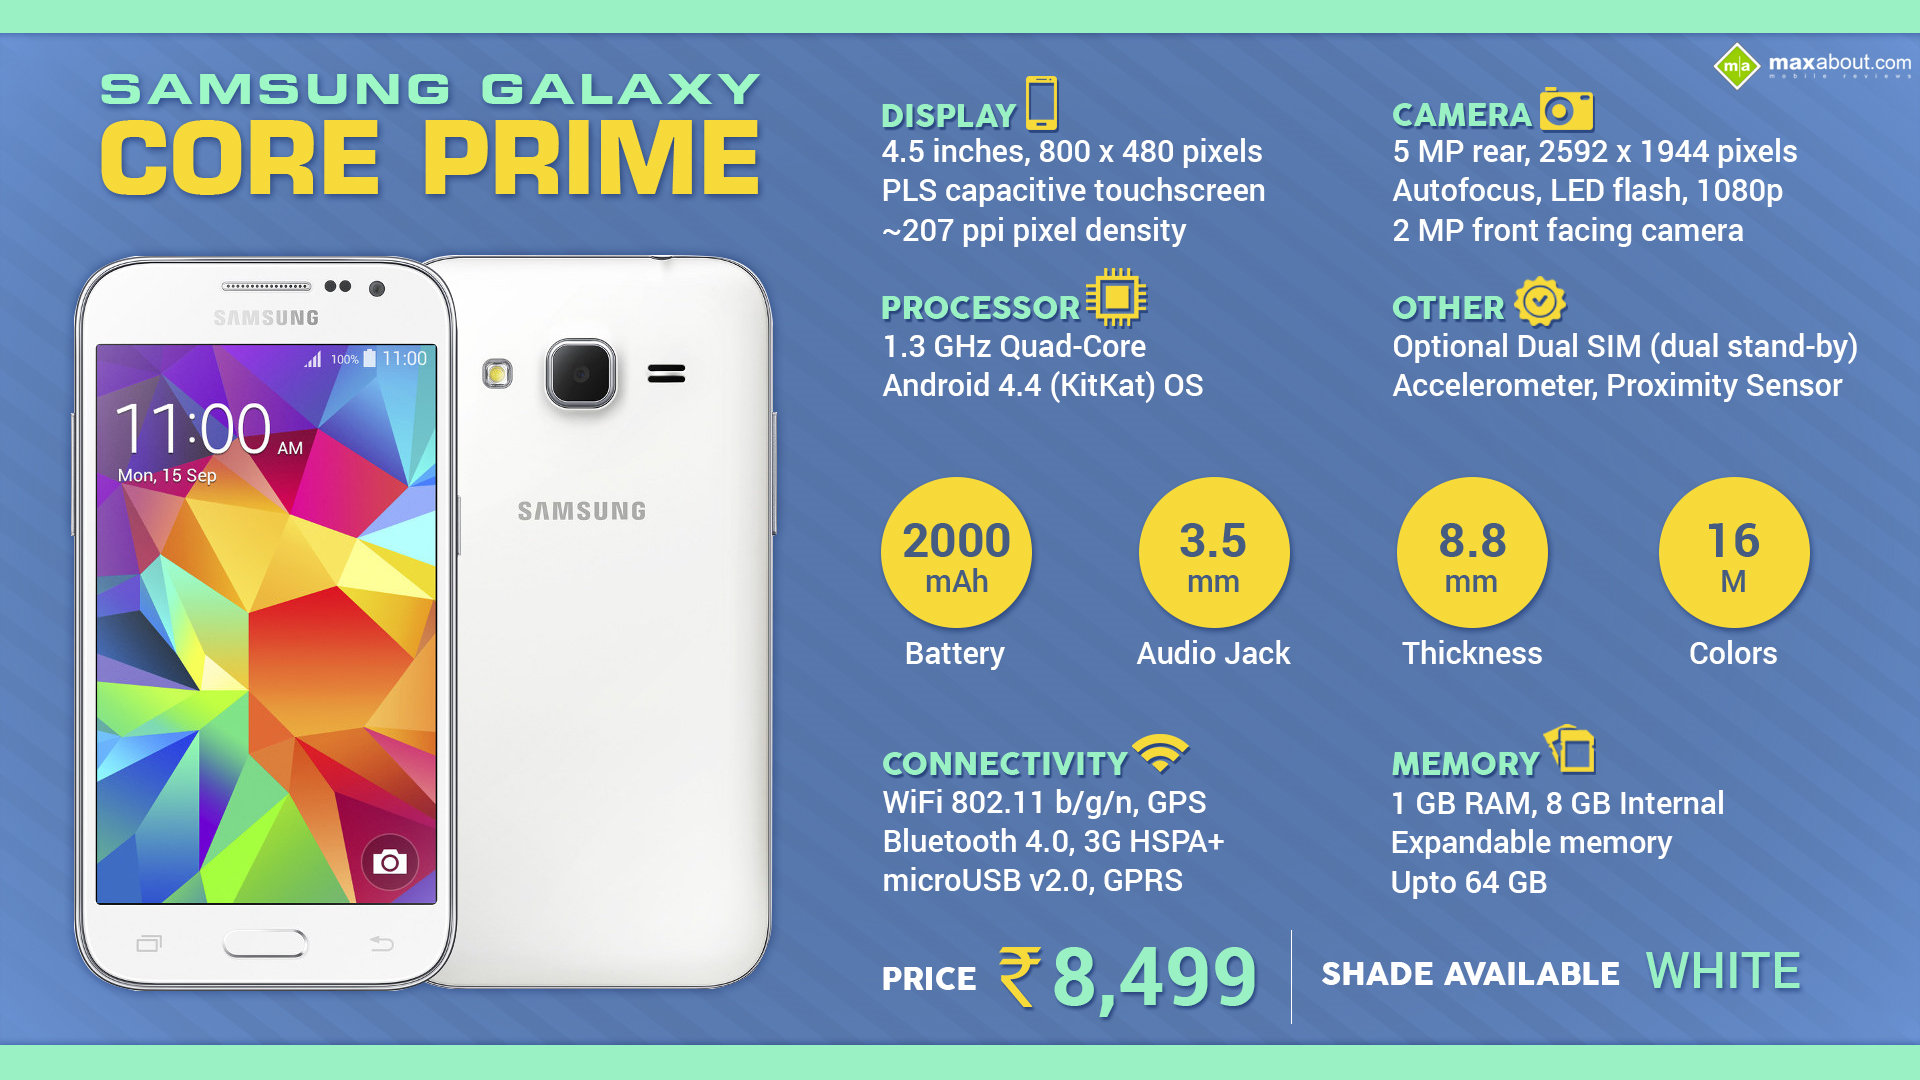 Quick Facts - Samsung Galaxy Core Prime